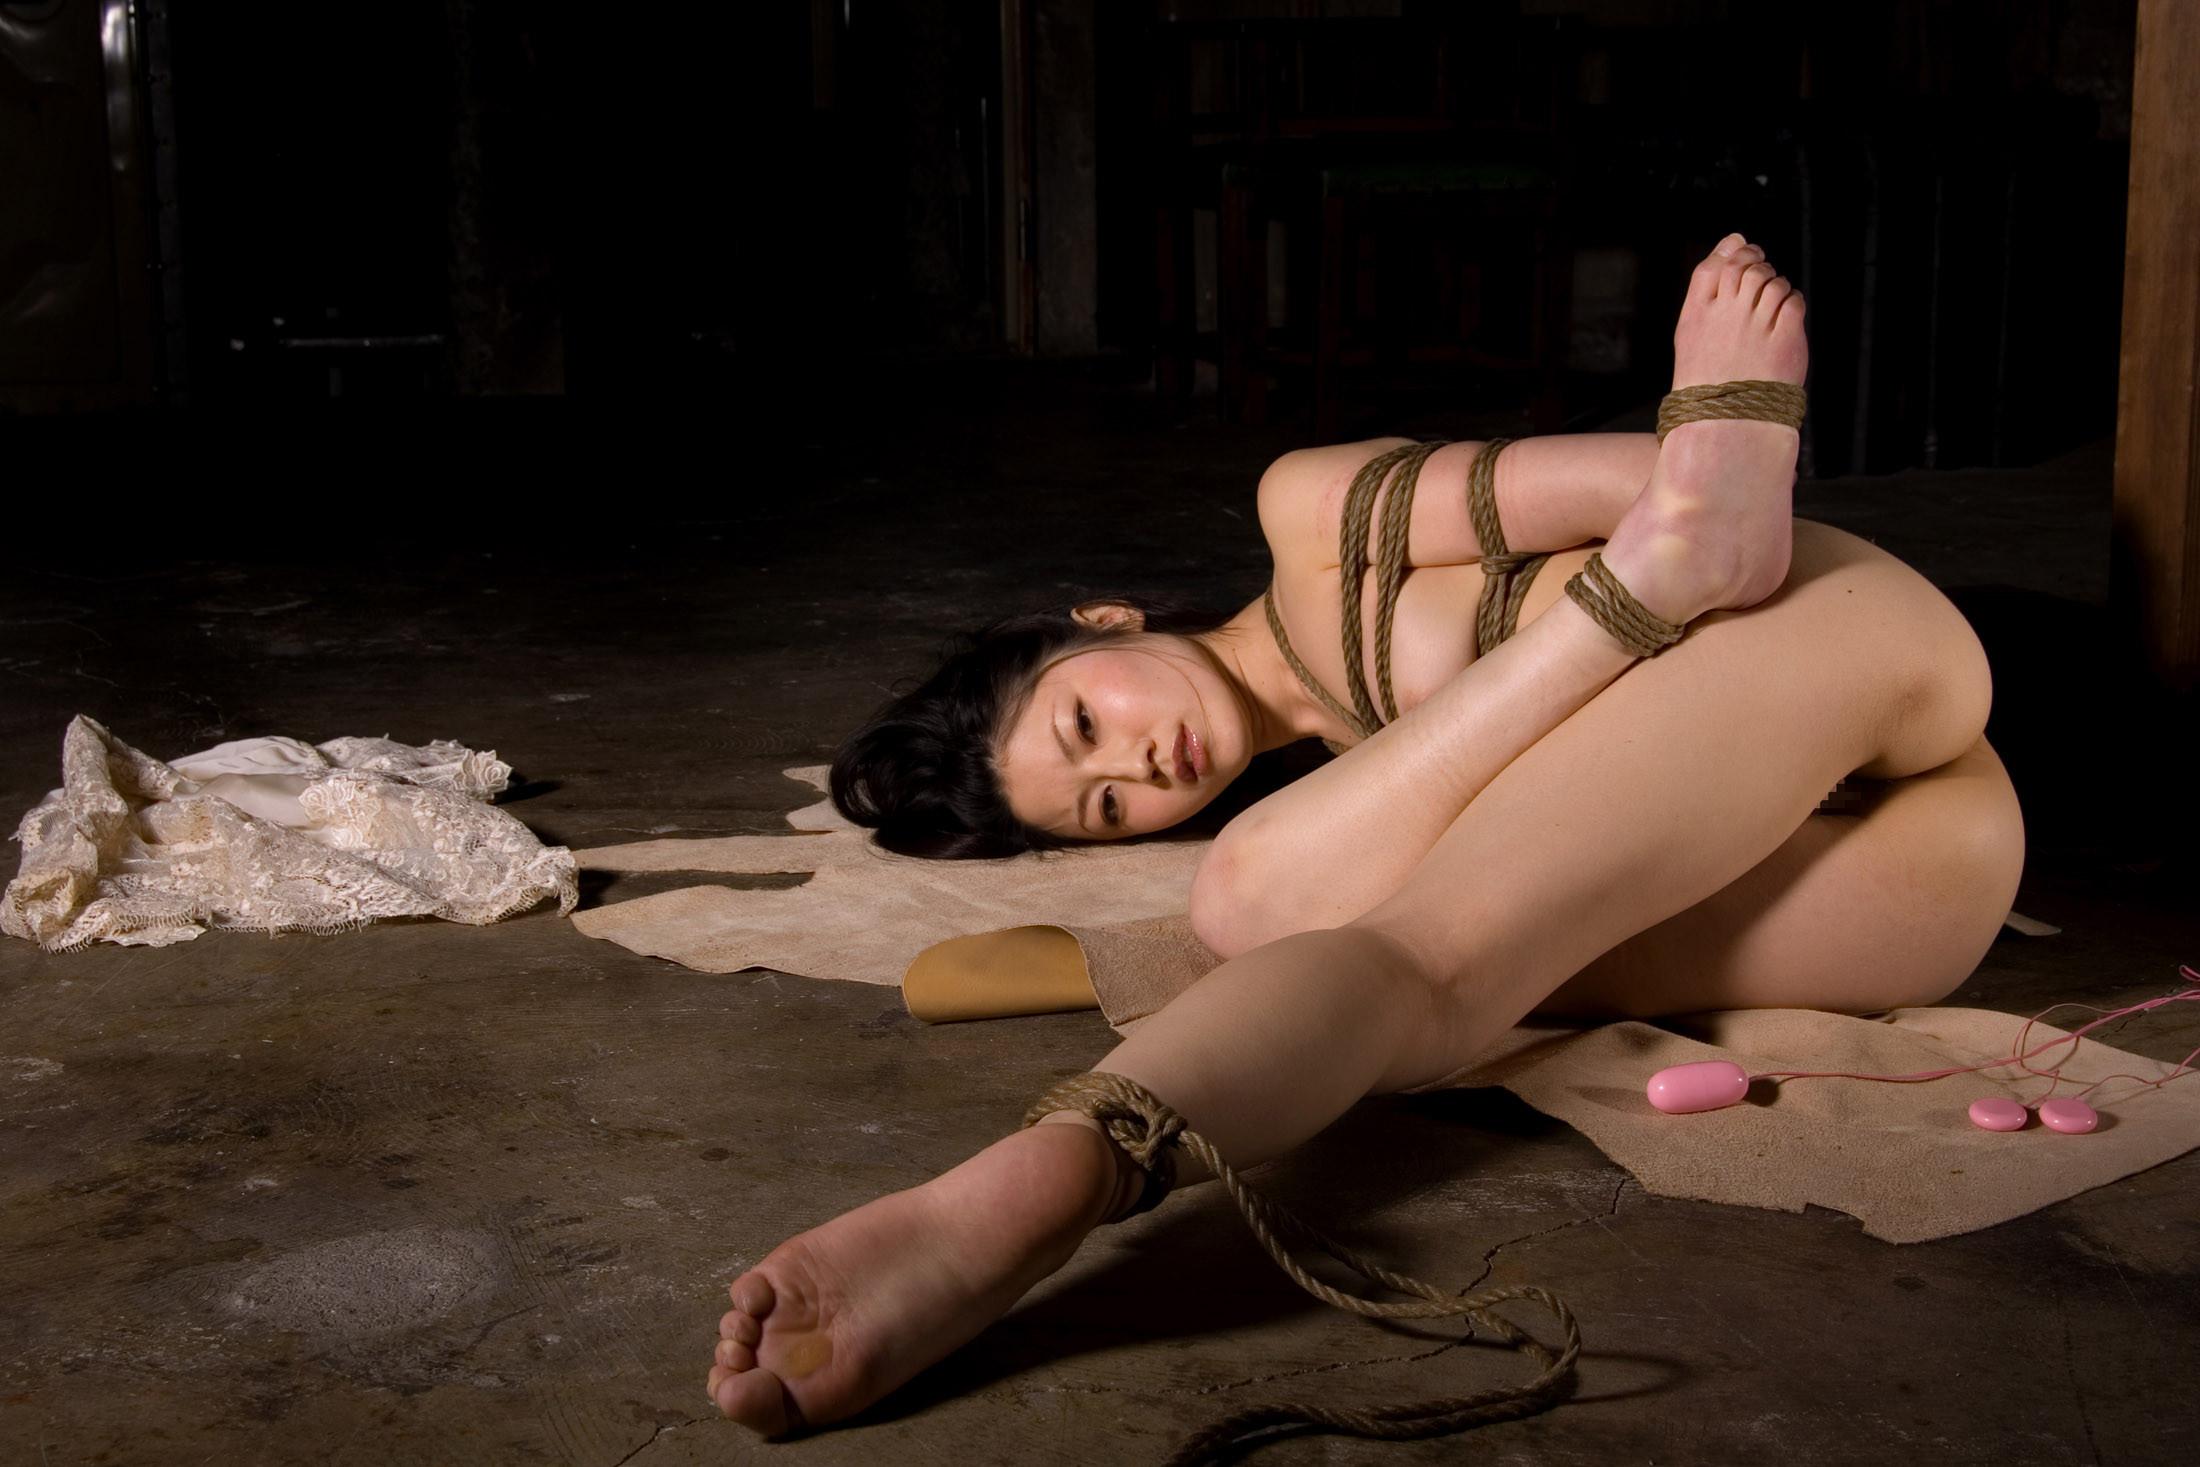 【SMエロ画像】苦痛の中にも心地よさが…美人たちの官能的縄化粧!(;・∀・)